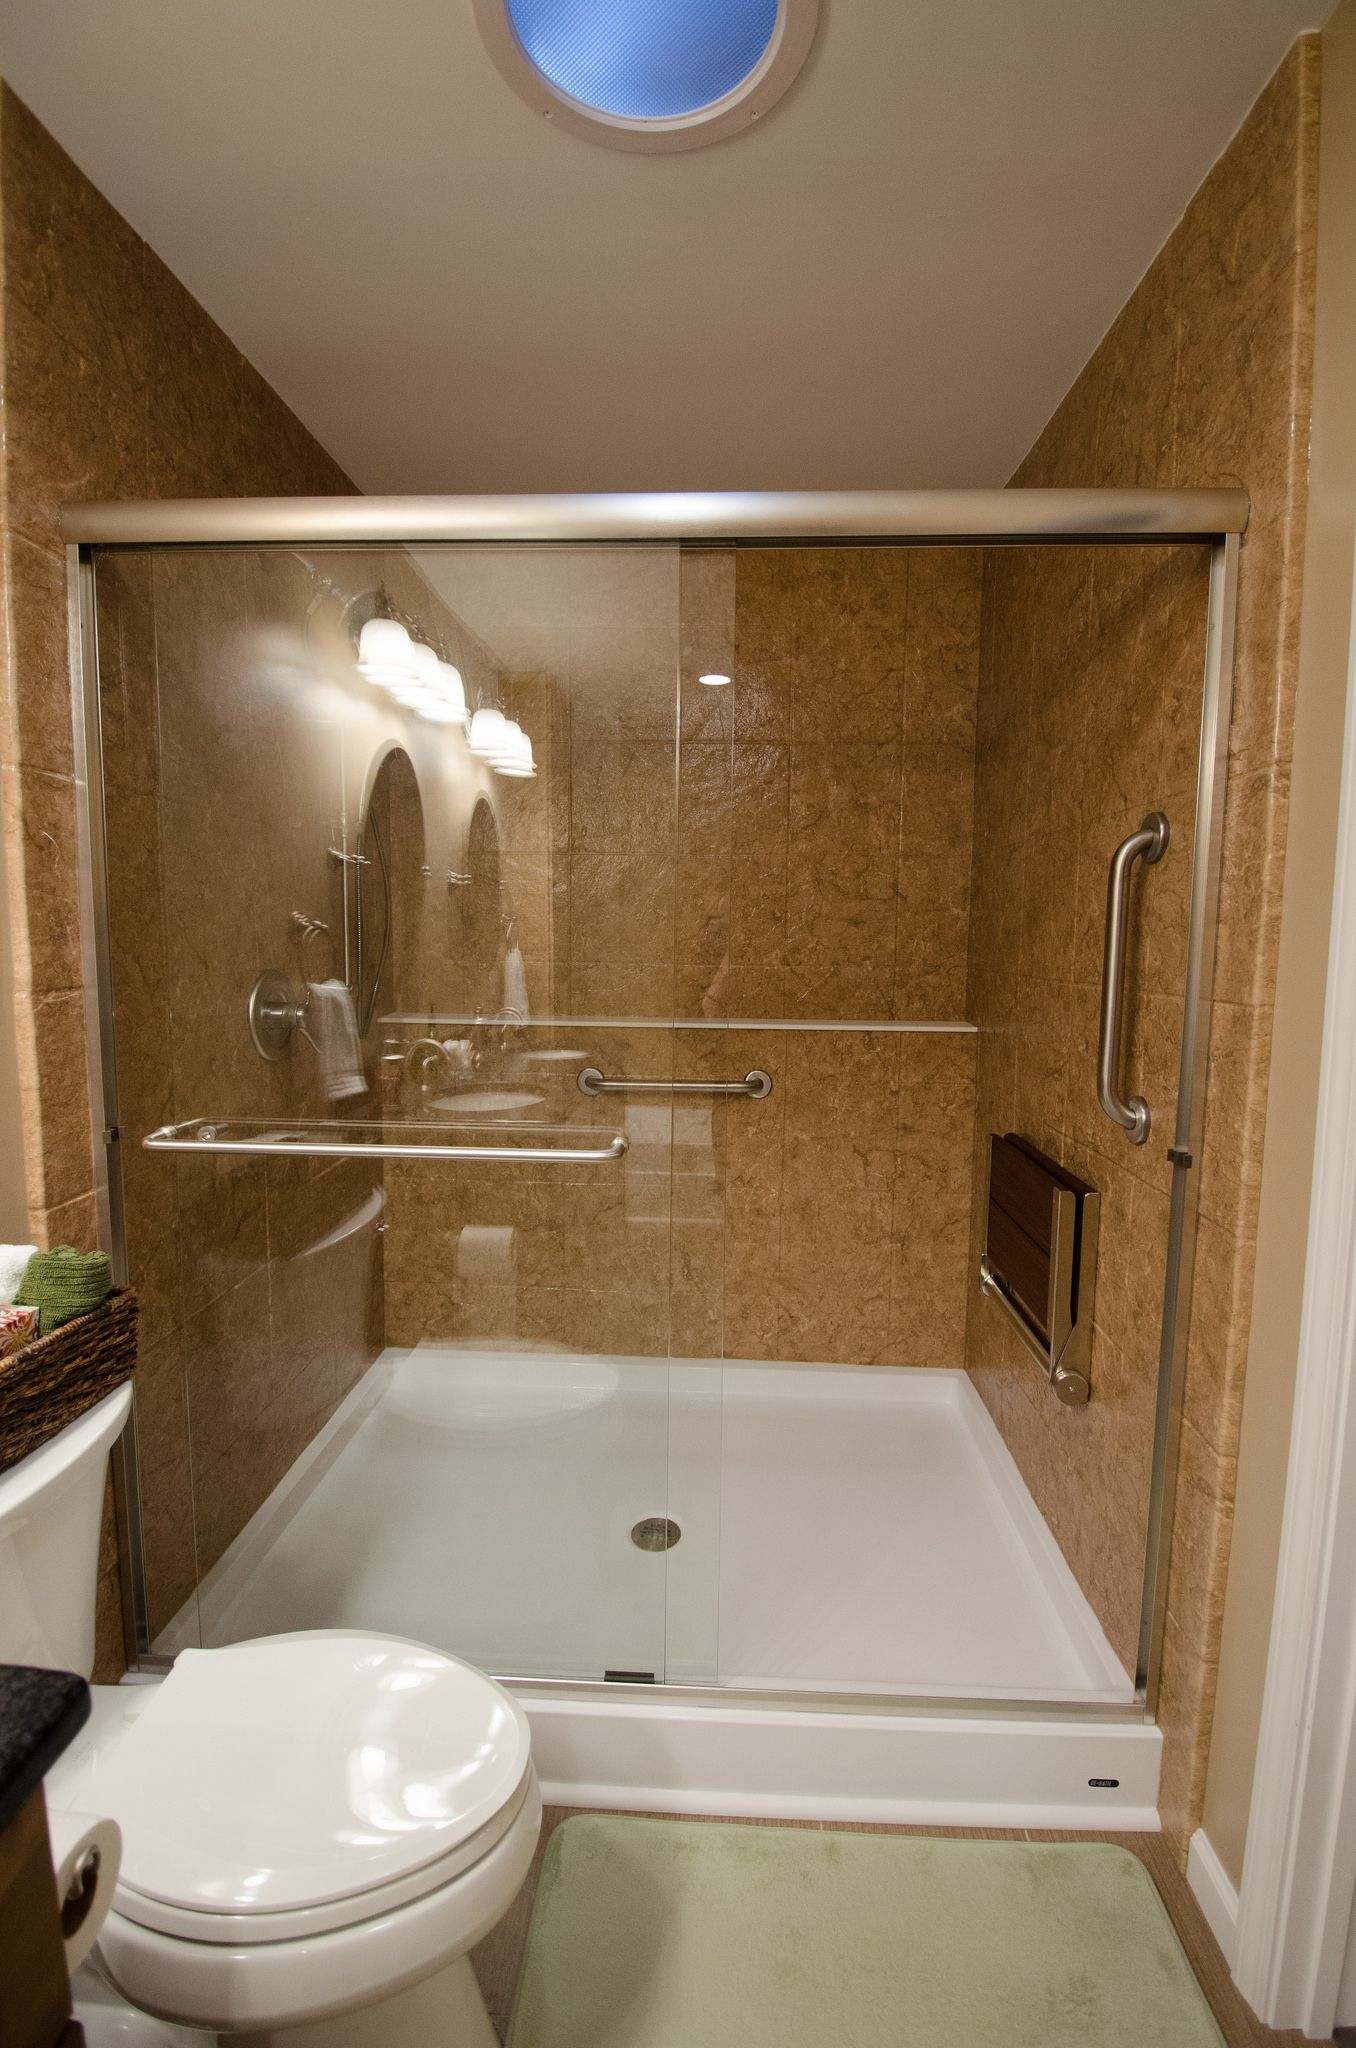 Large Bathtubs With Shower | o2 Pilates